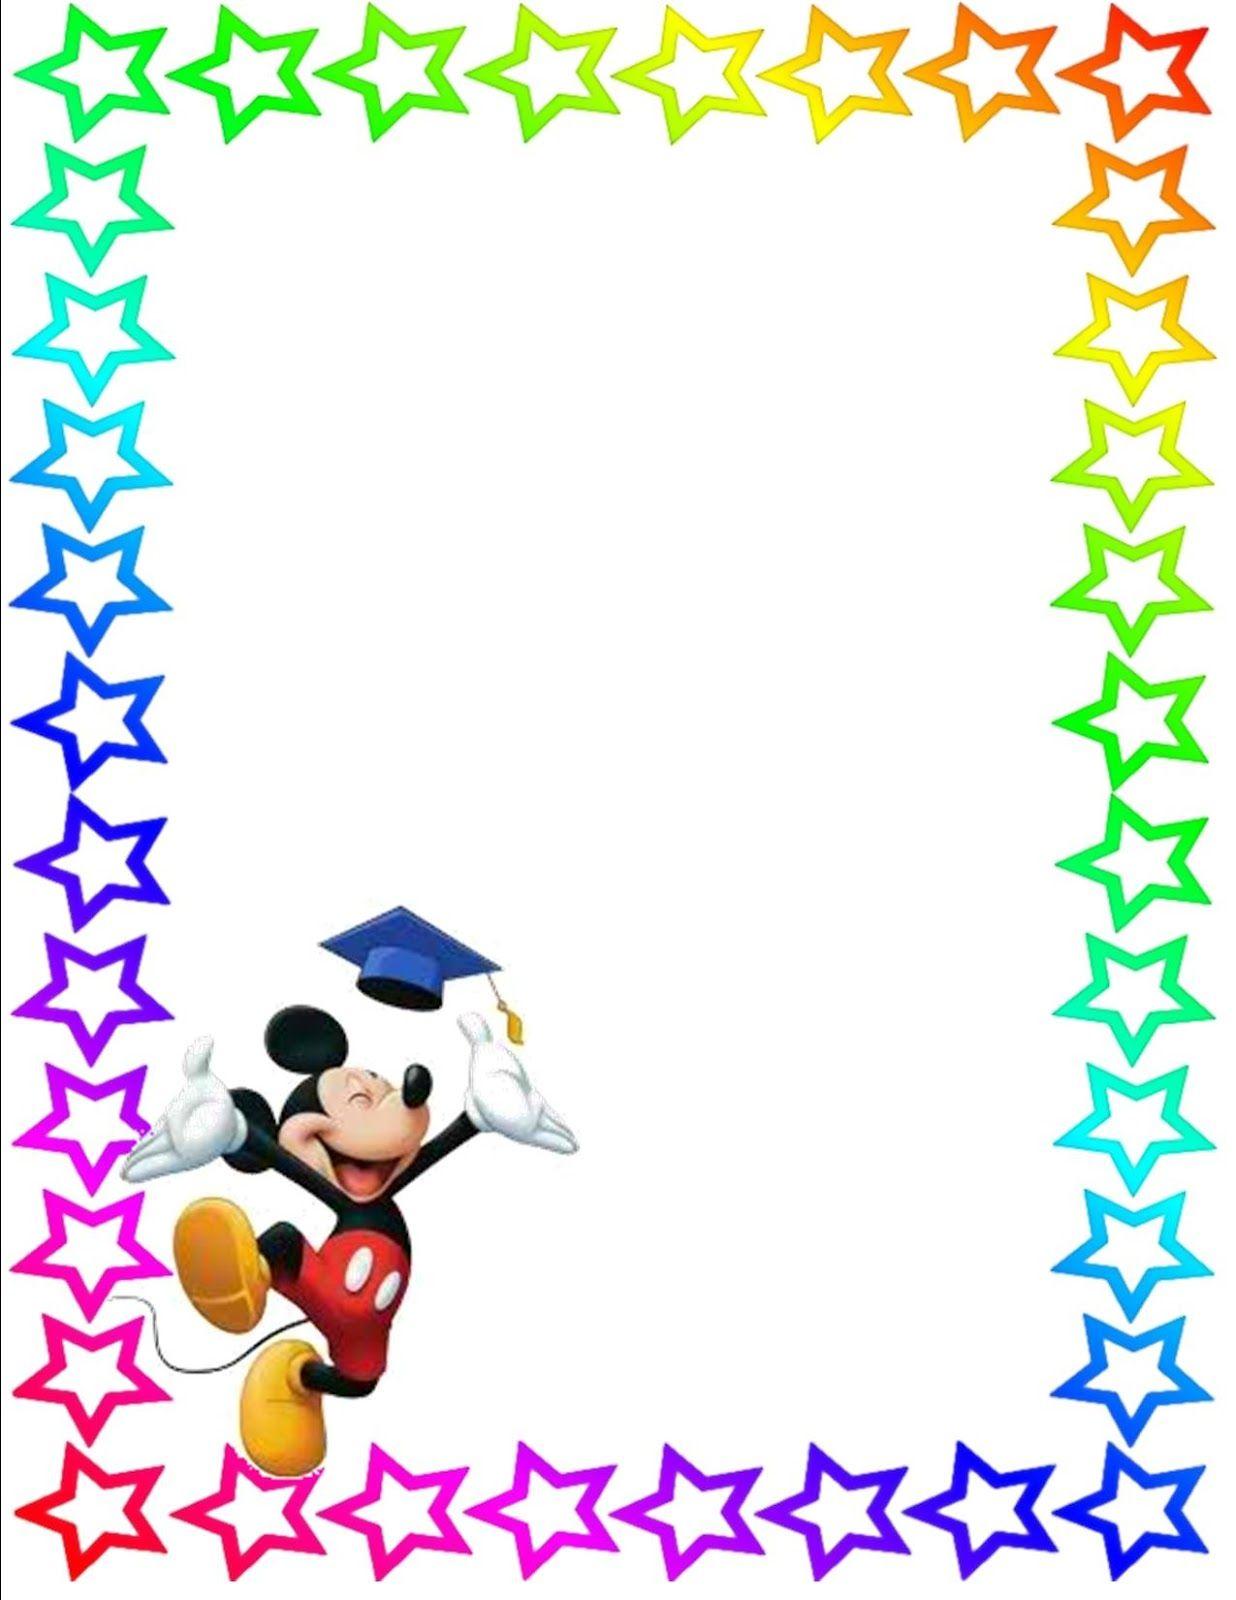 crayon border clipart panda free clipart images disney 39 s rh pinterest com disney christmas clipart borders